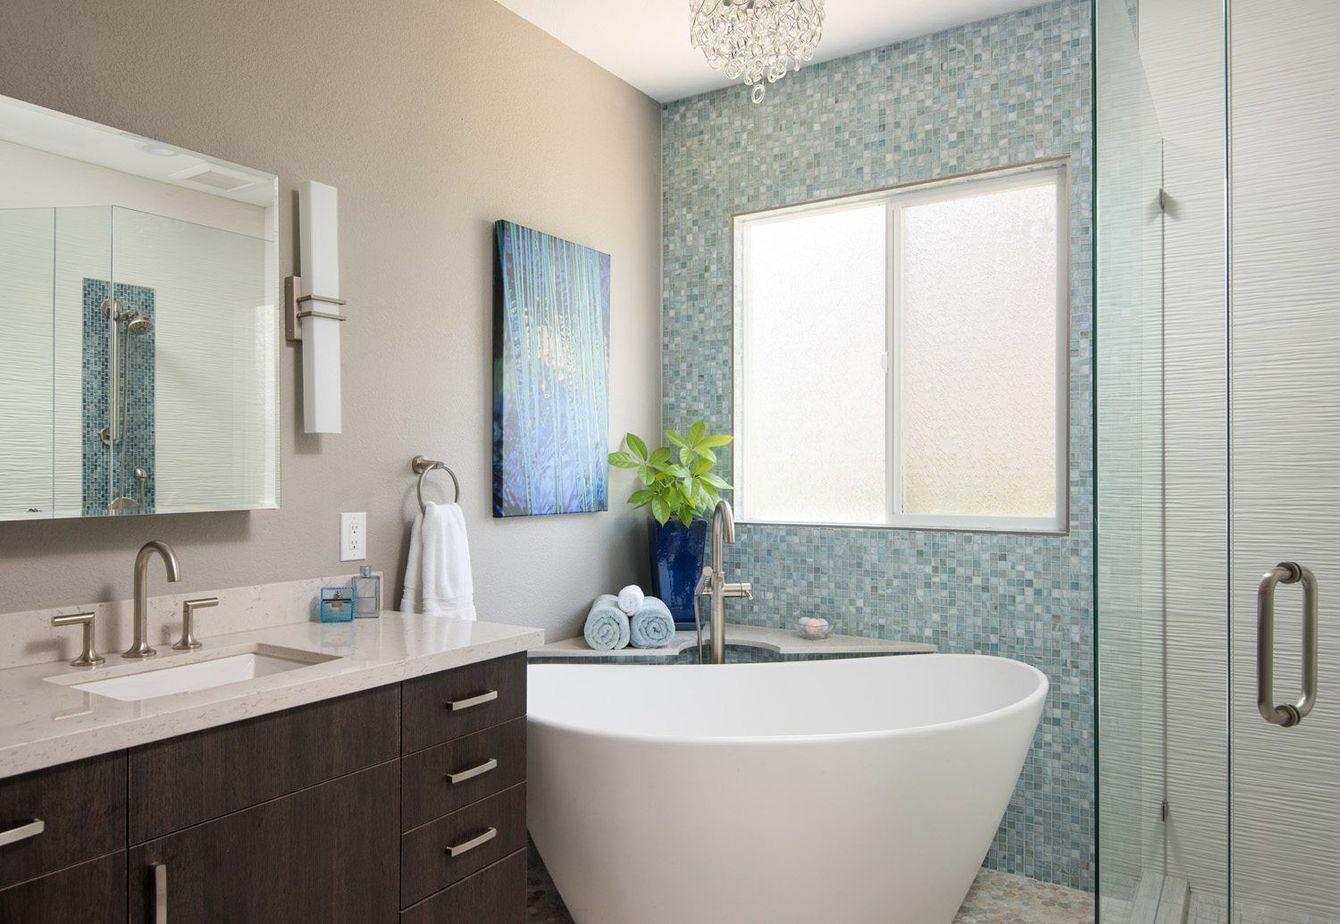 100 images bathroom remodel contractor